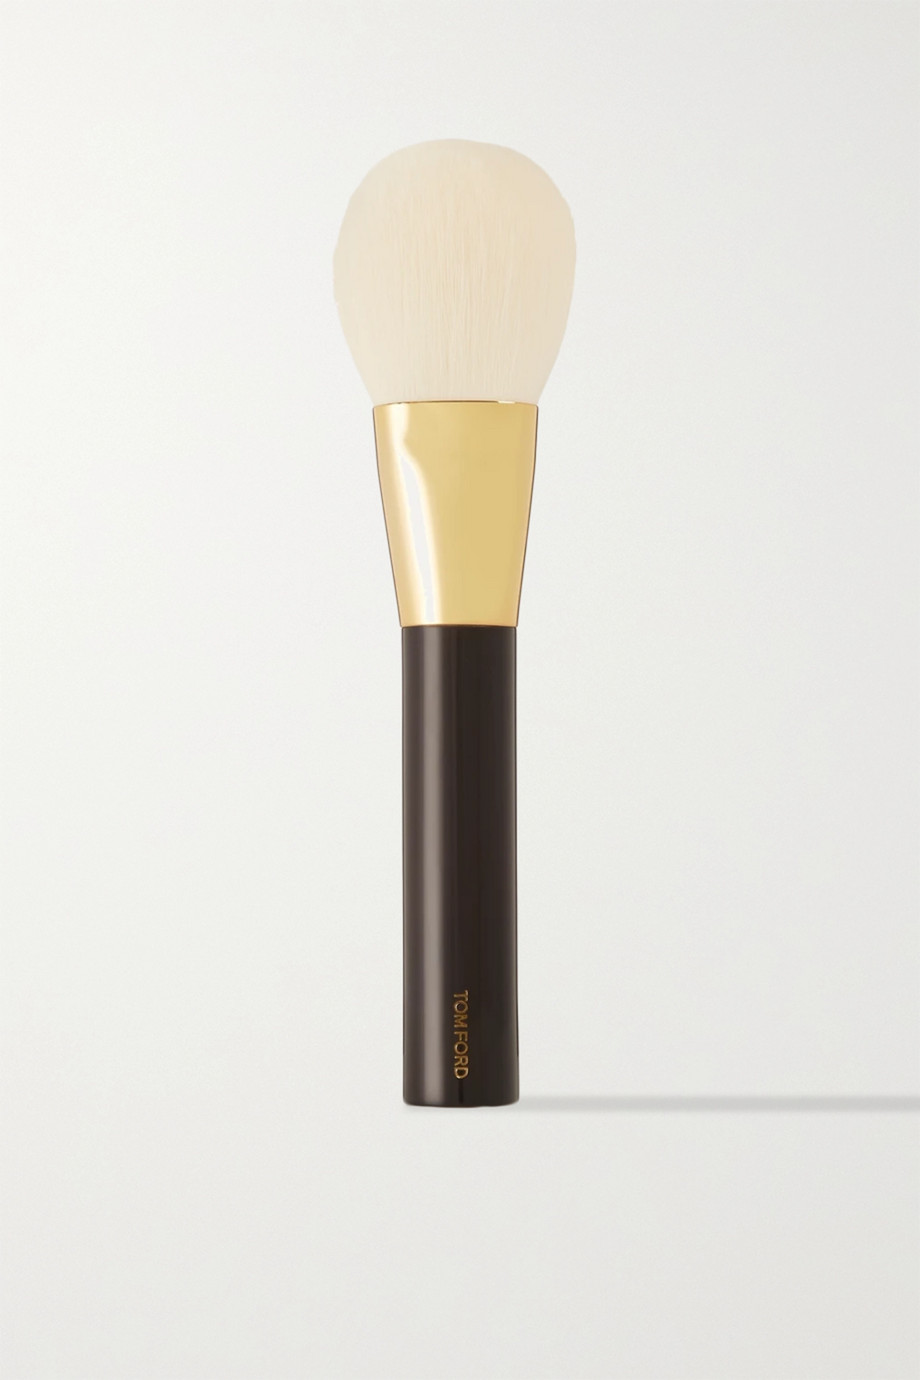 TOM FORD BEAUTY Bronzer Brush 05 – Bronzer-Pinsel